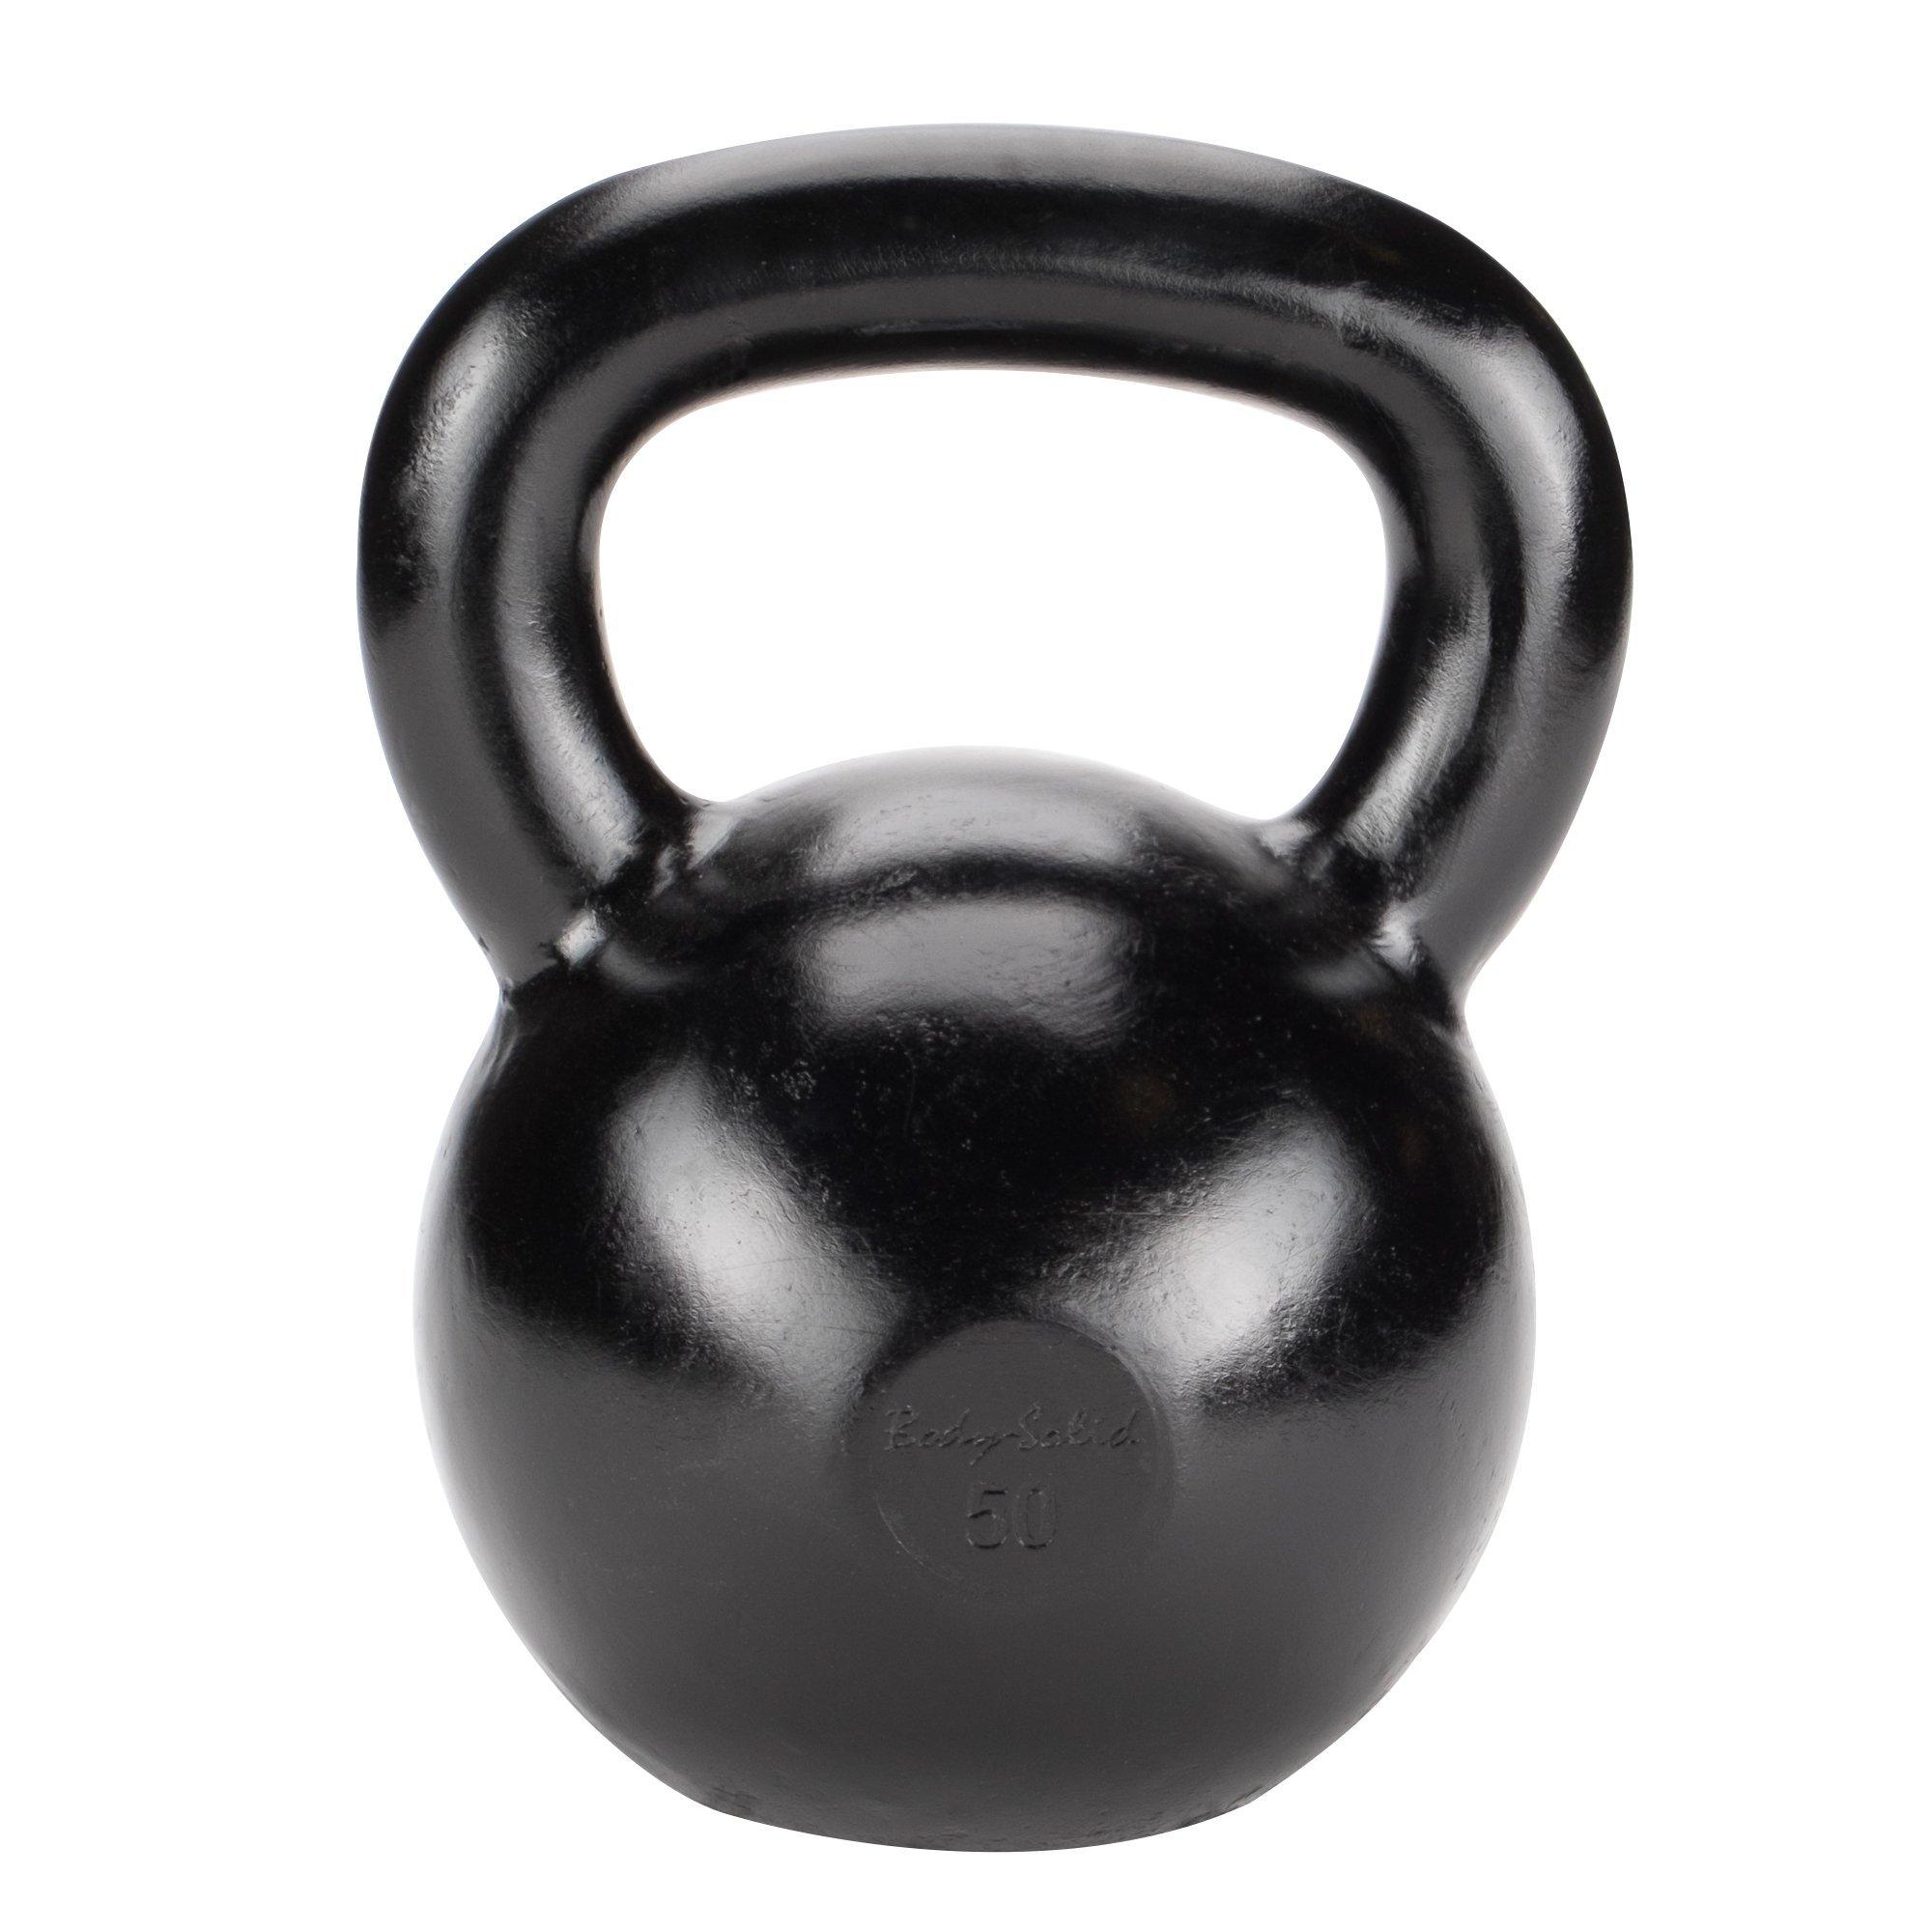 Body-Solid 50 lb. Kettlebell